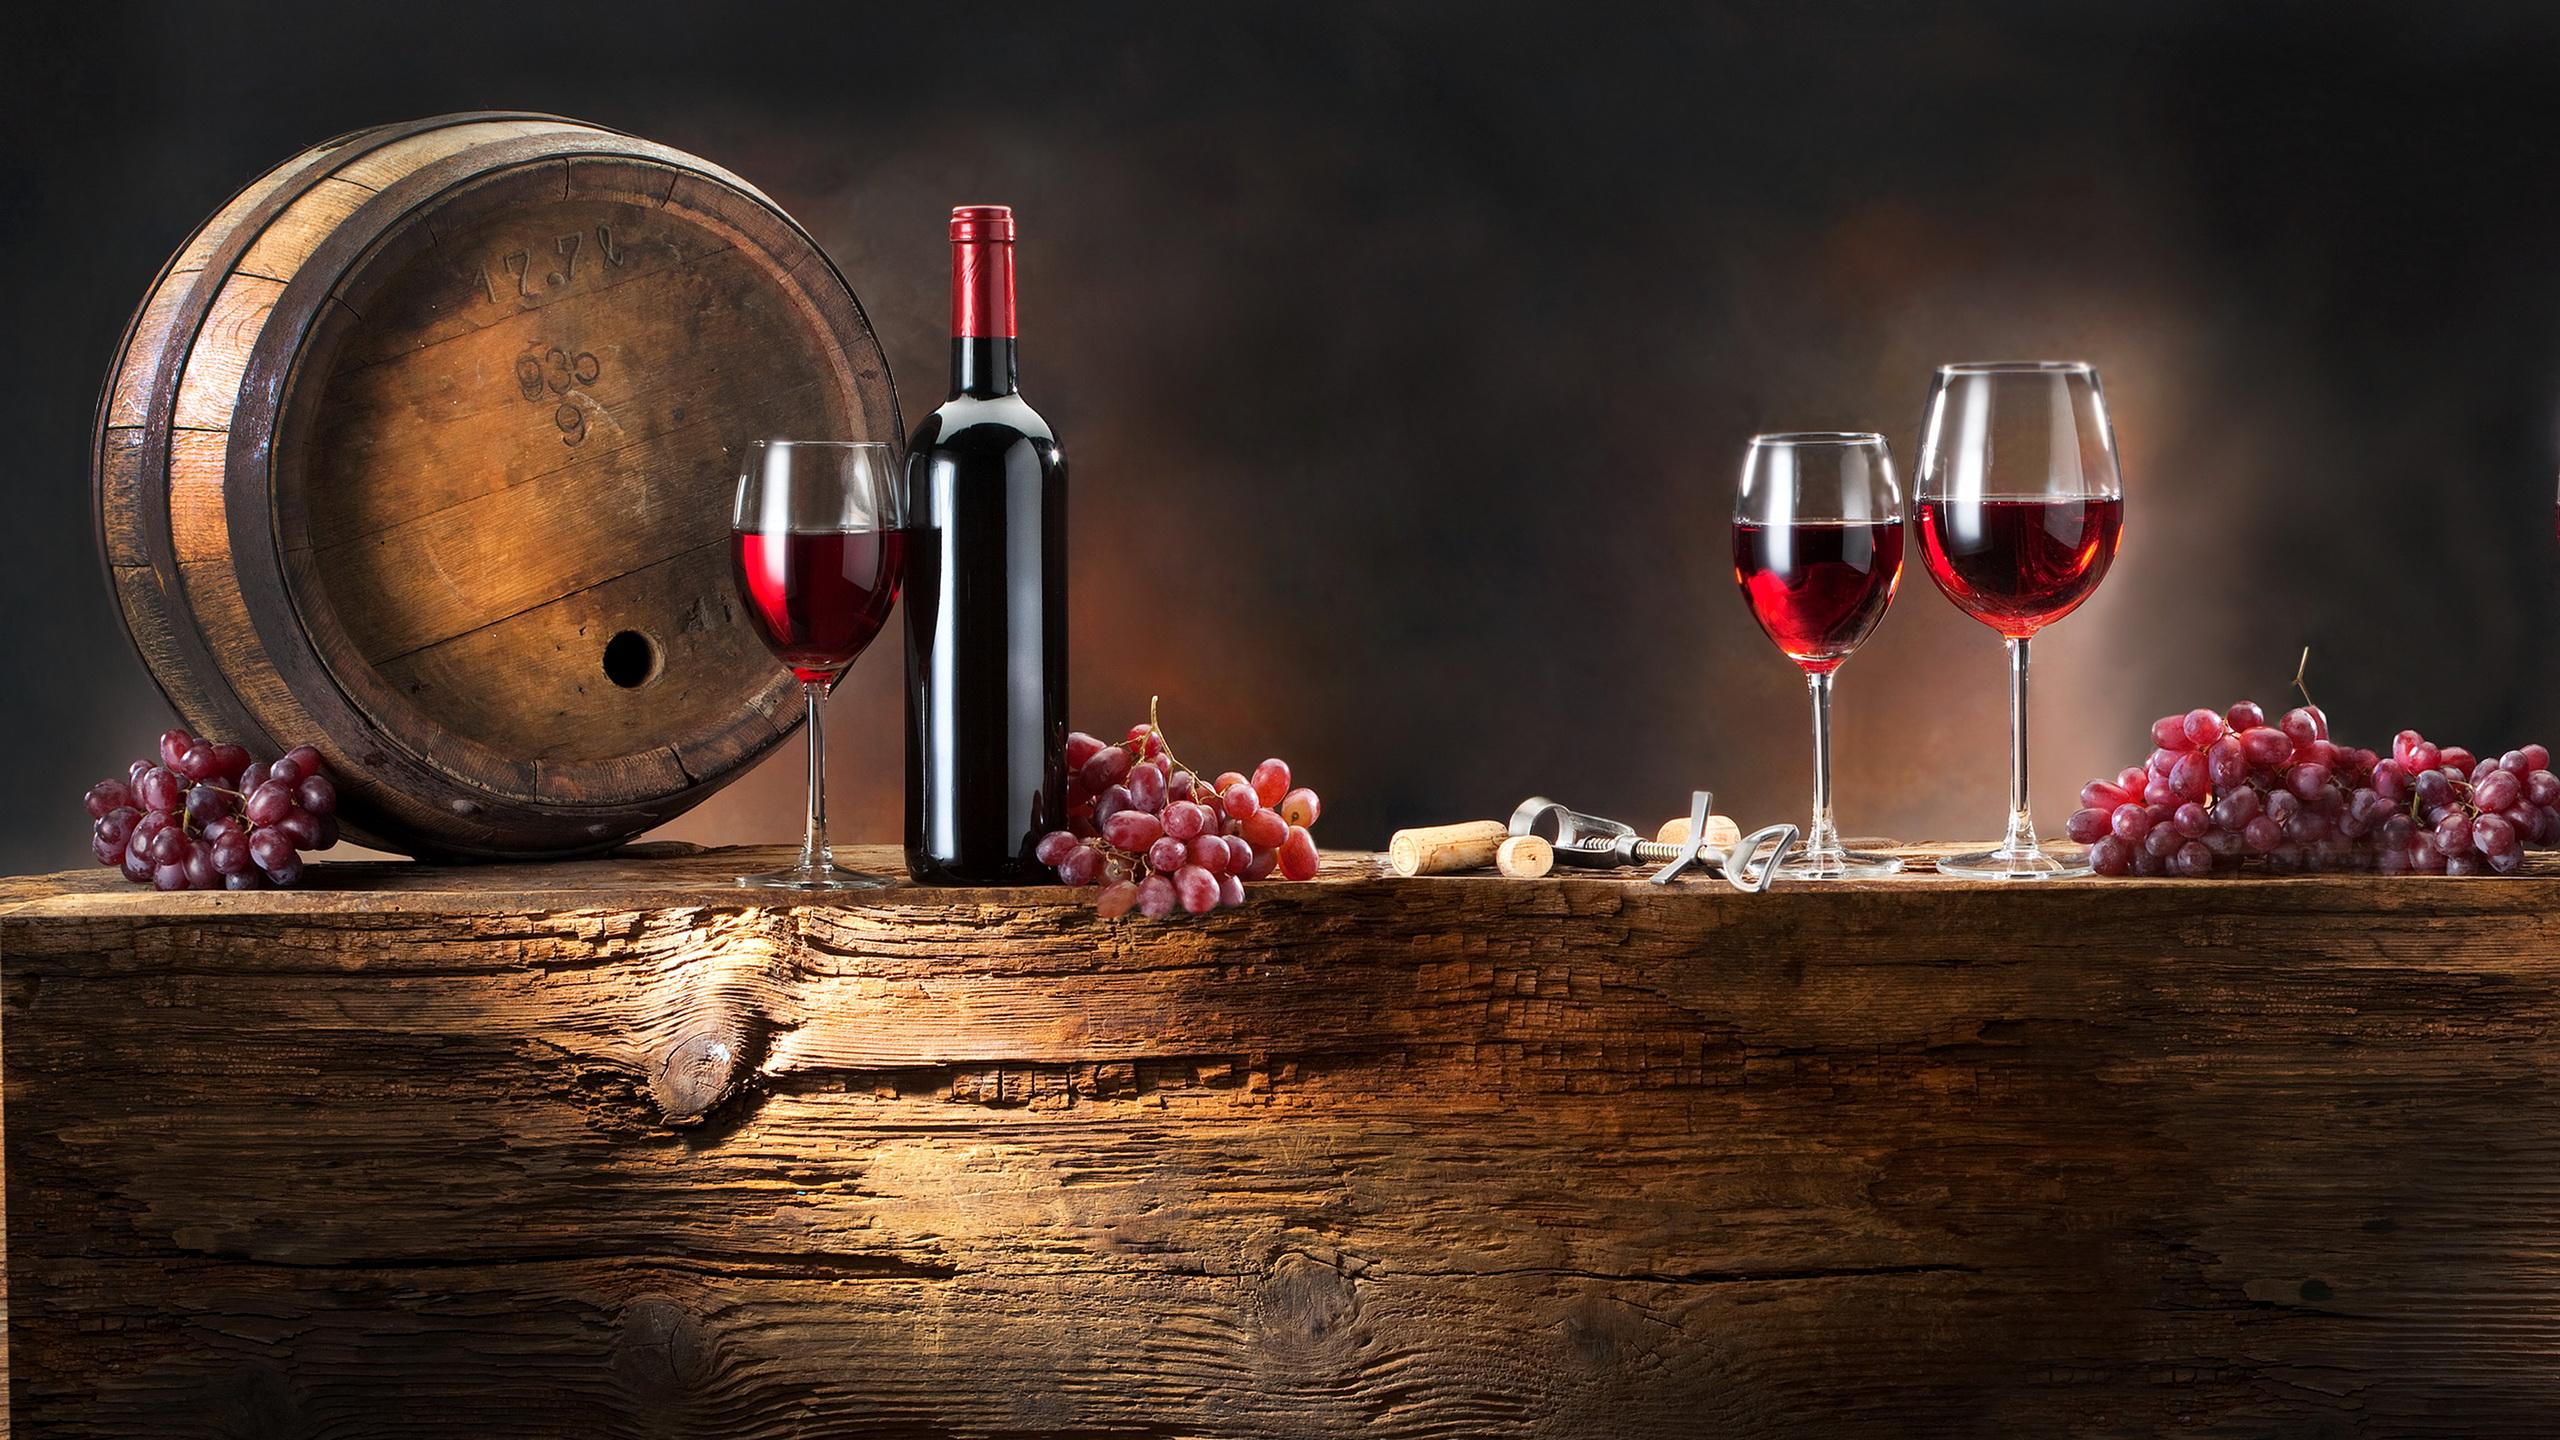 Вино - Wine (55 обоев) » Смотри Красивые ...: lookw.ru/eda/102-vino-wine-55-oboev.html